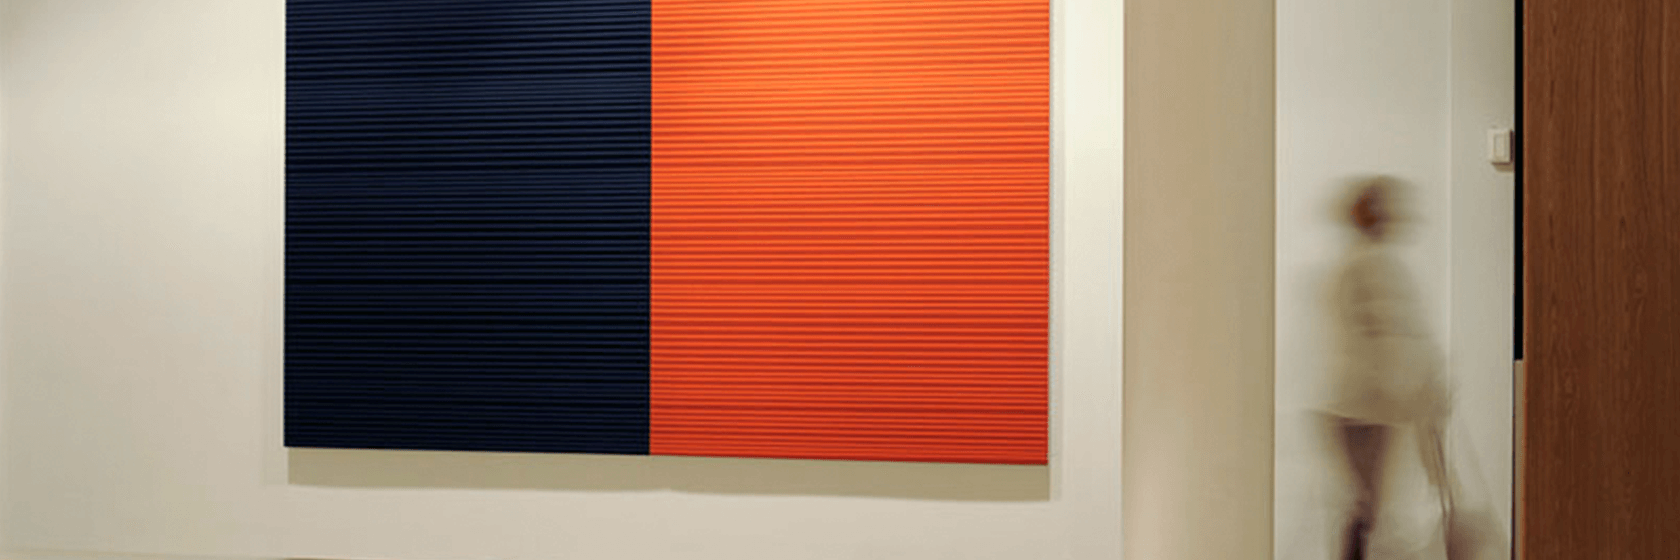 SLOW LIGHT per Francisco Suárez | The Room Studio